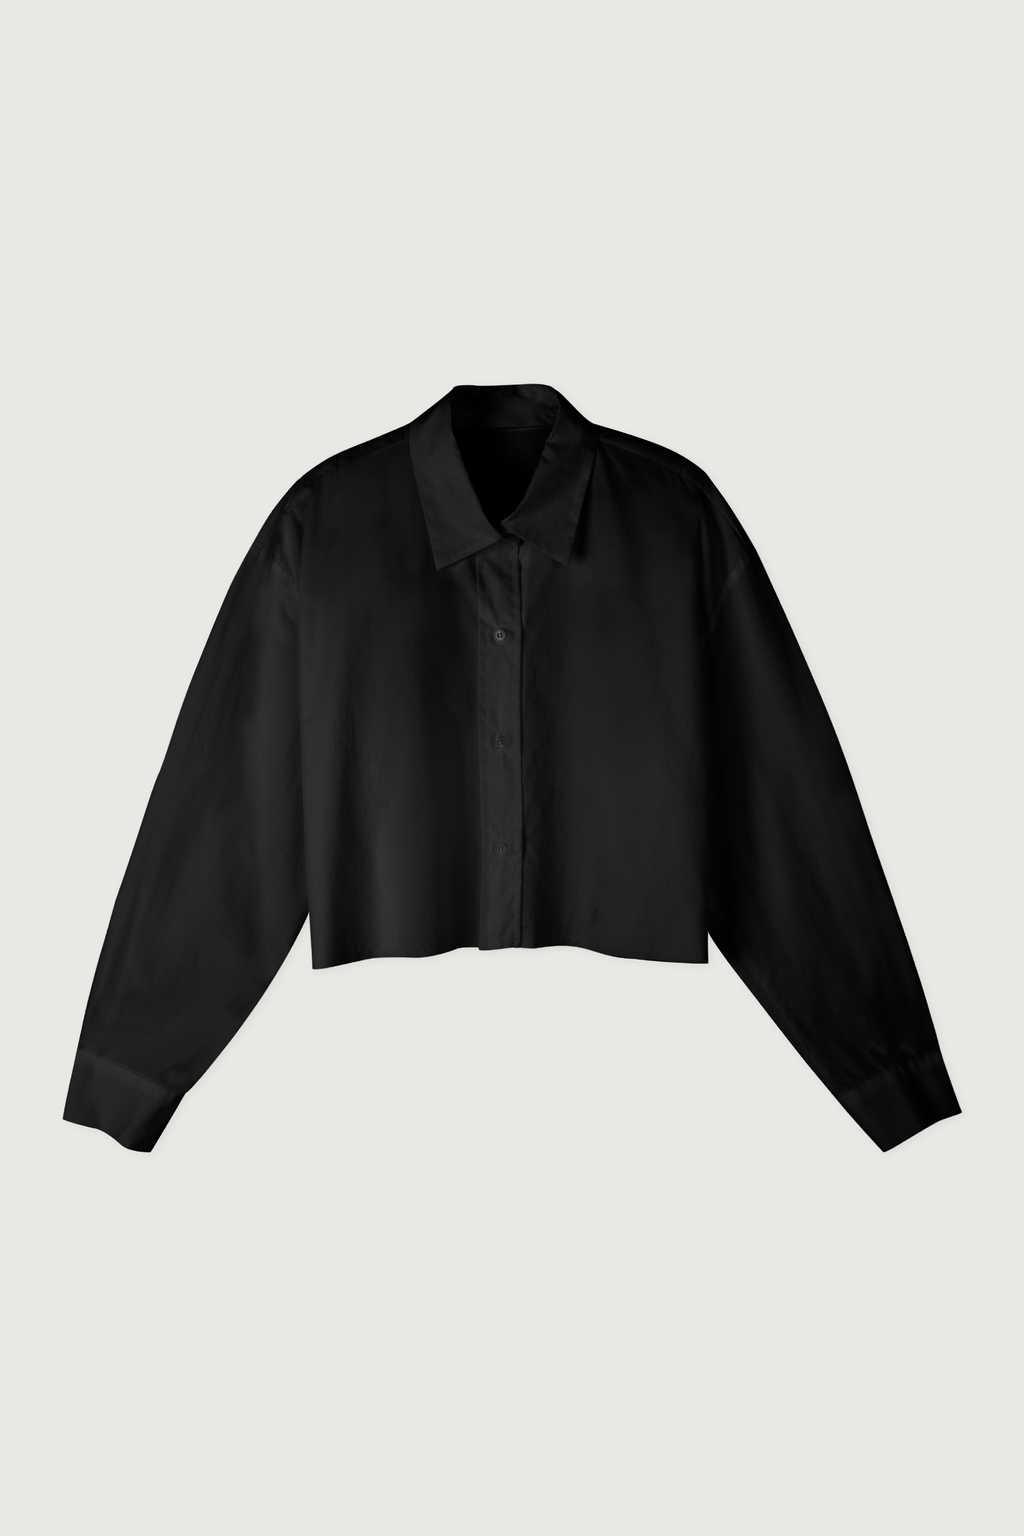 Blouse K008 Black 7